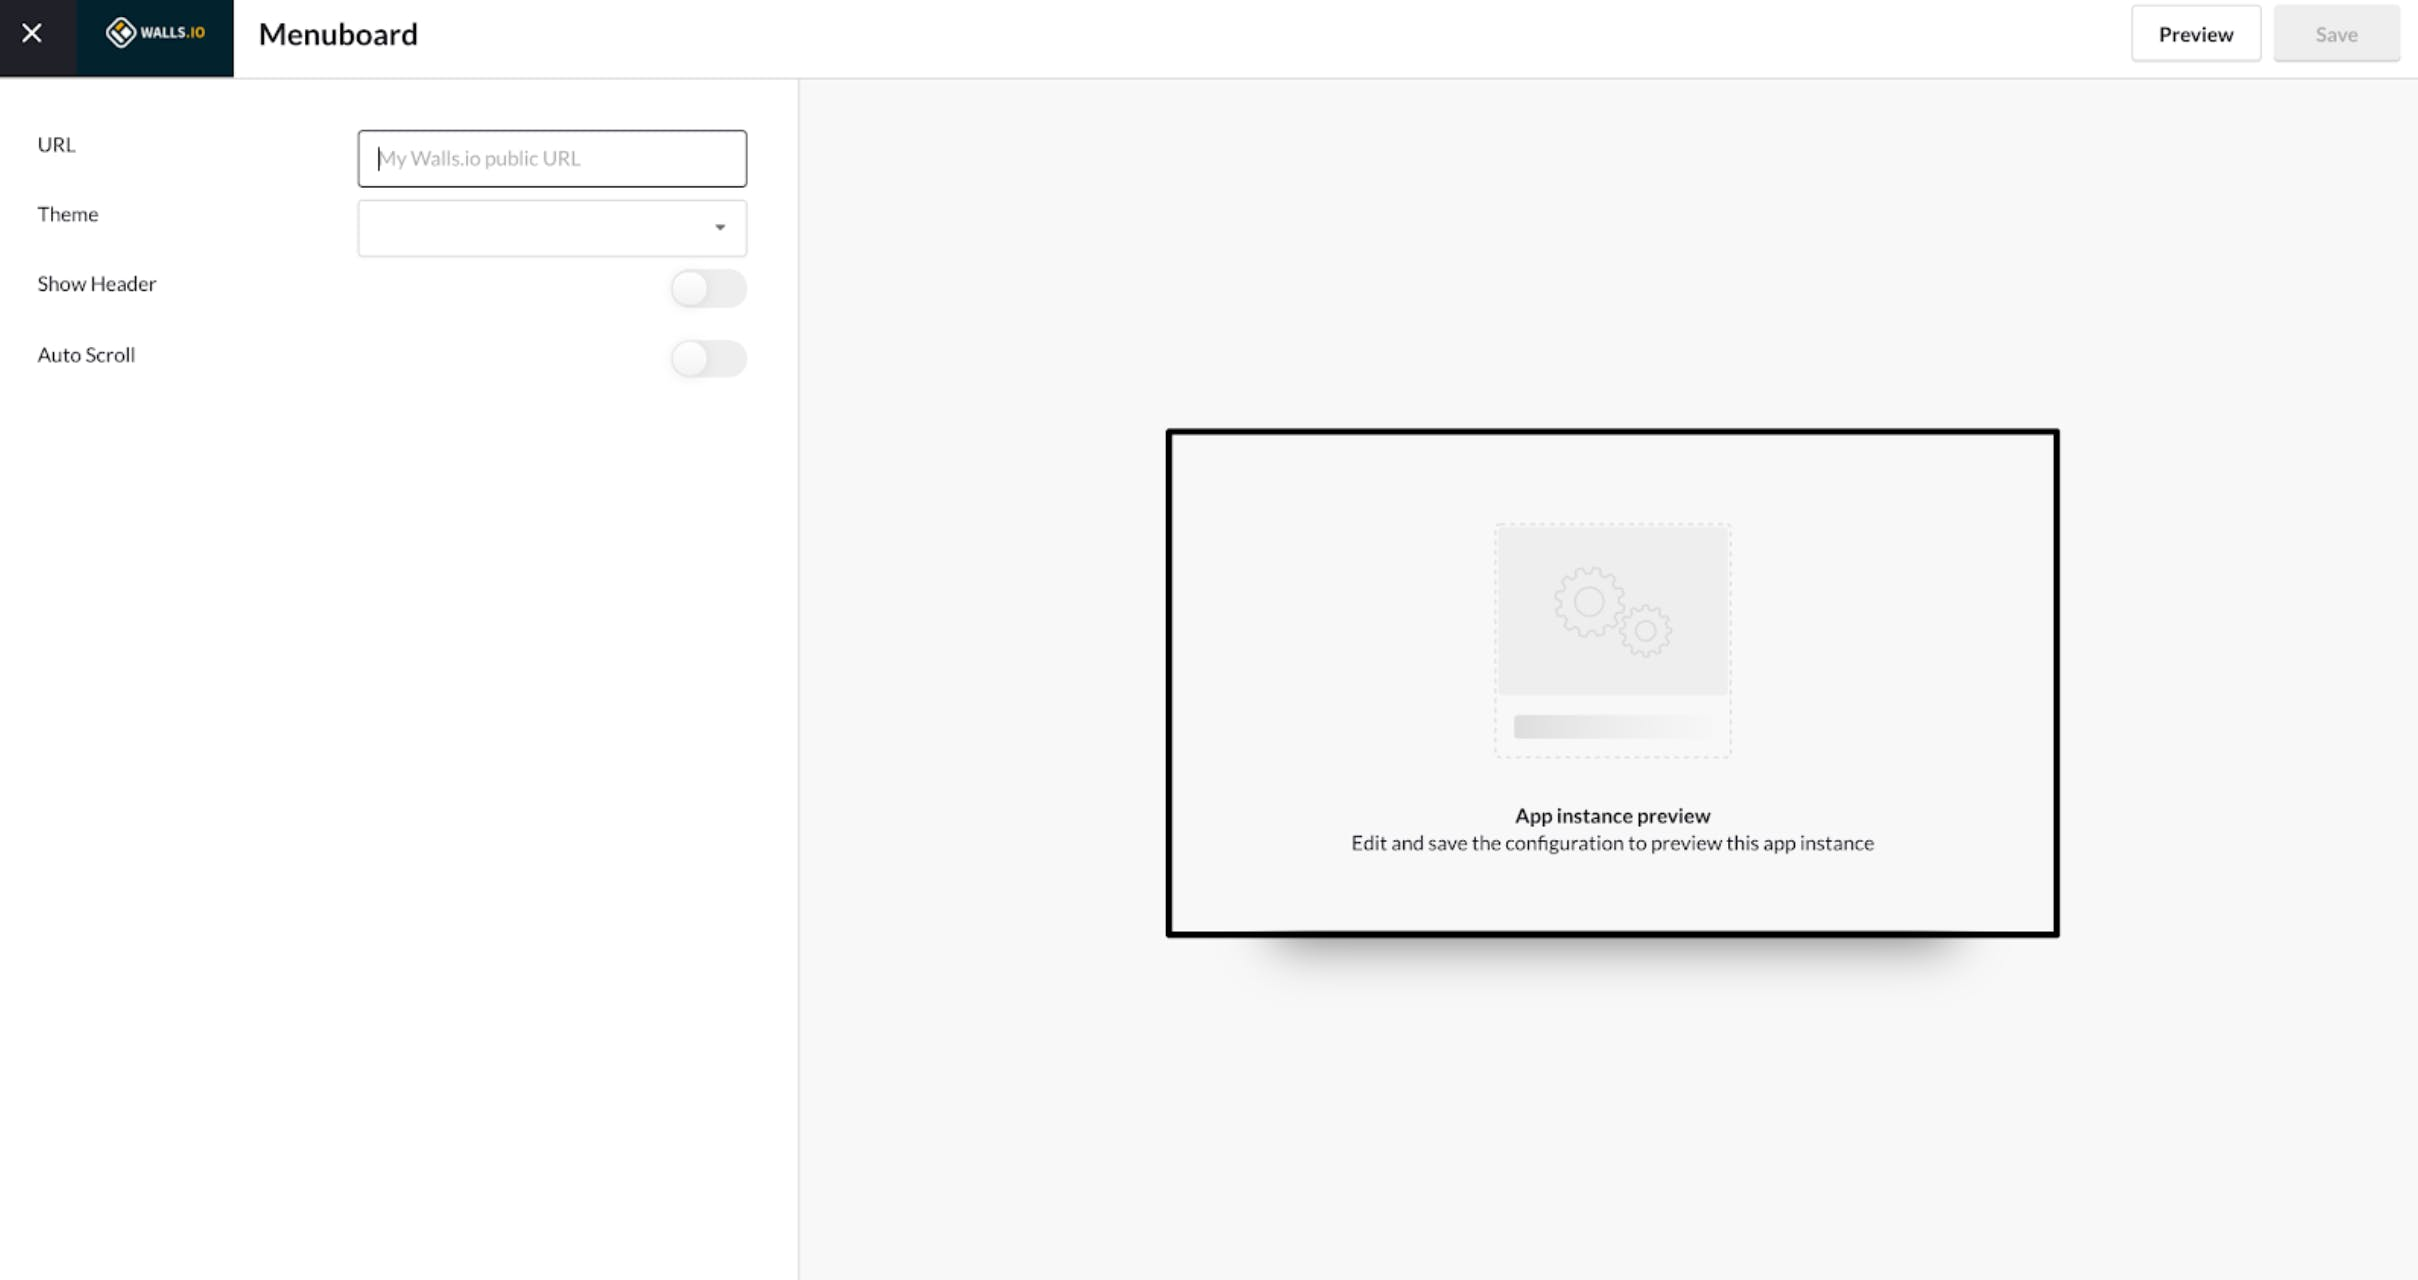 ScreenCloud Walls.io App Guide - App Console 1.21.2021.png